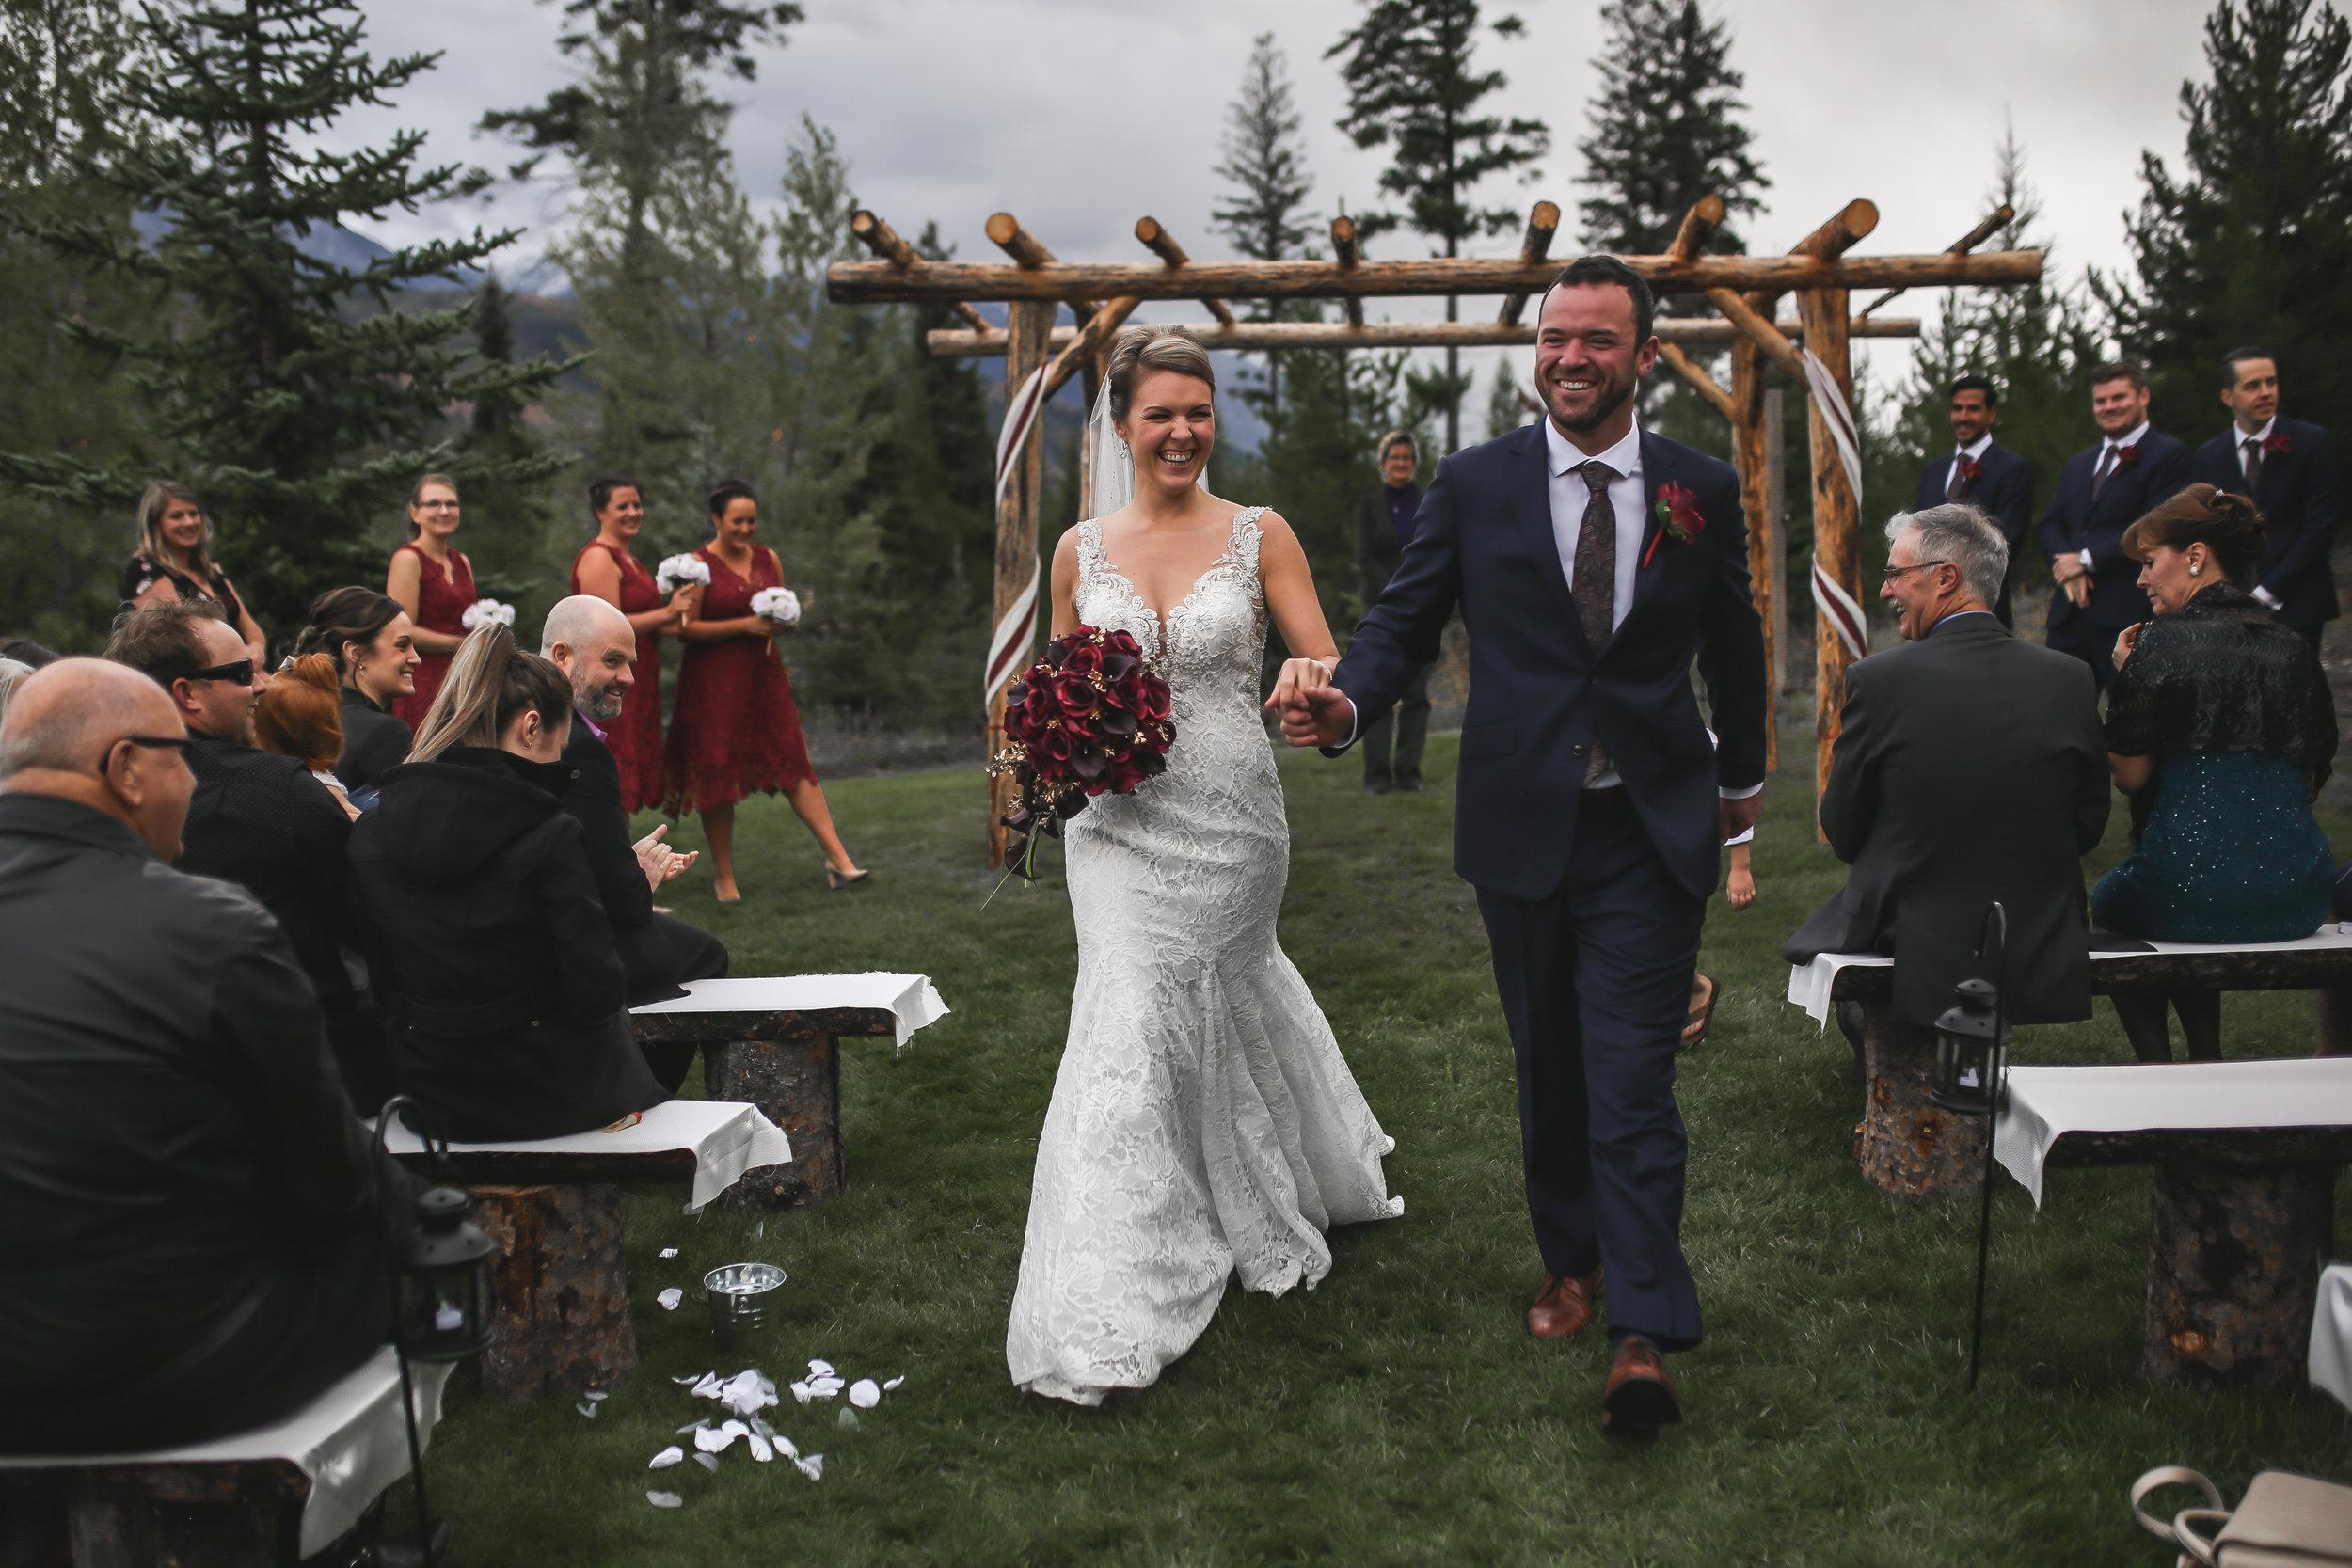 145 Adam Ziorio Photography - Vitoria wedding photographer Nick&Bree Fernie Wedding.jpg